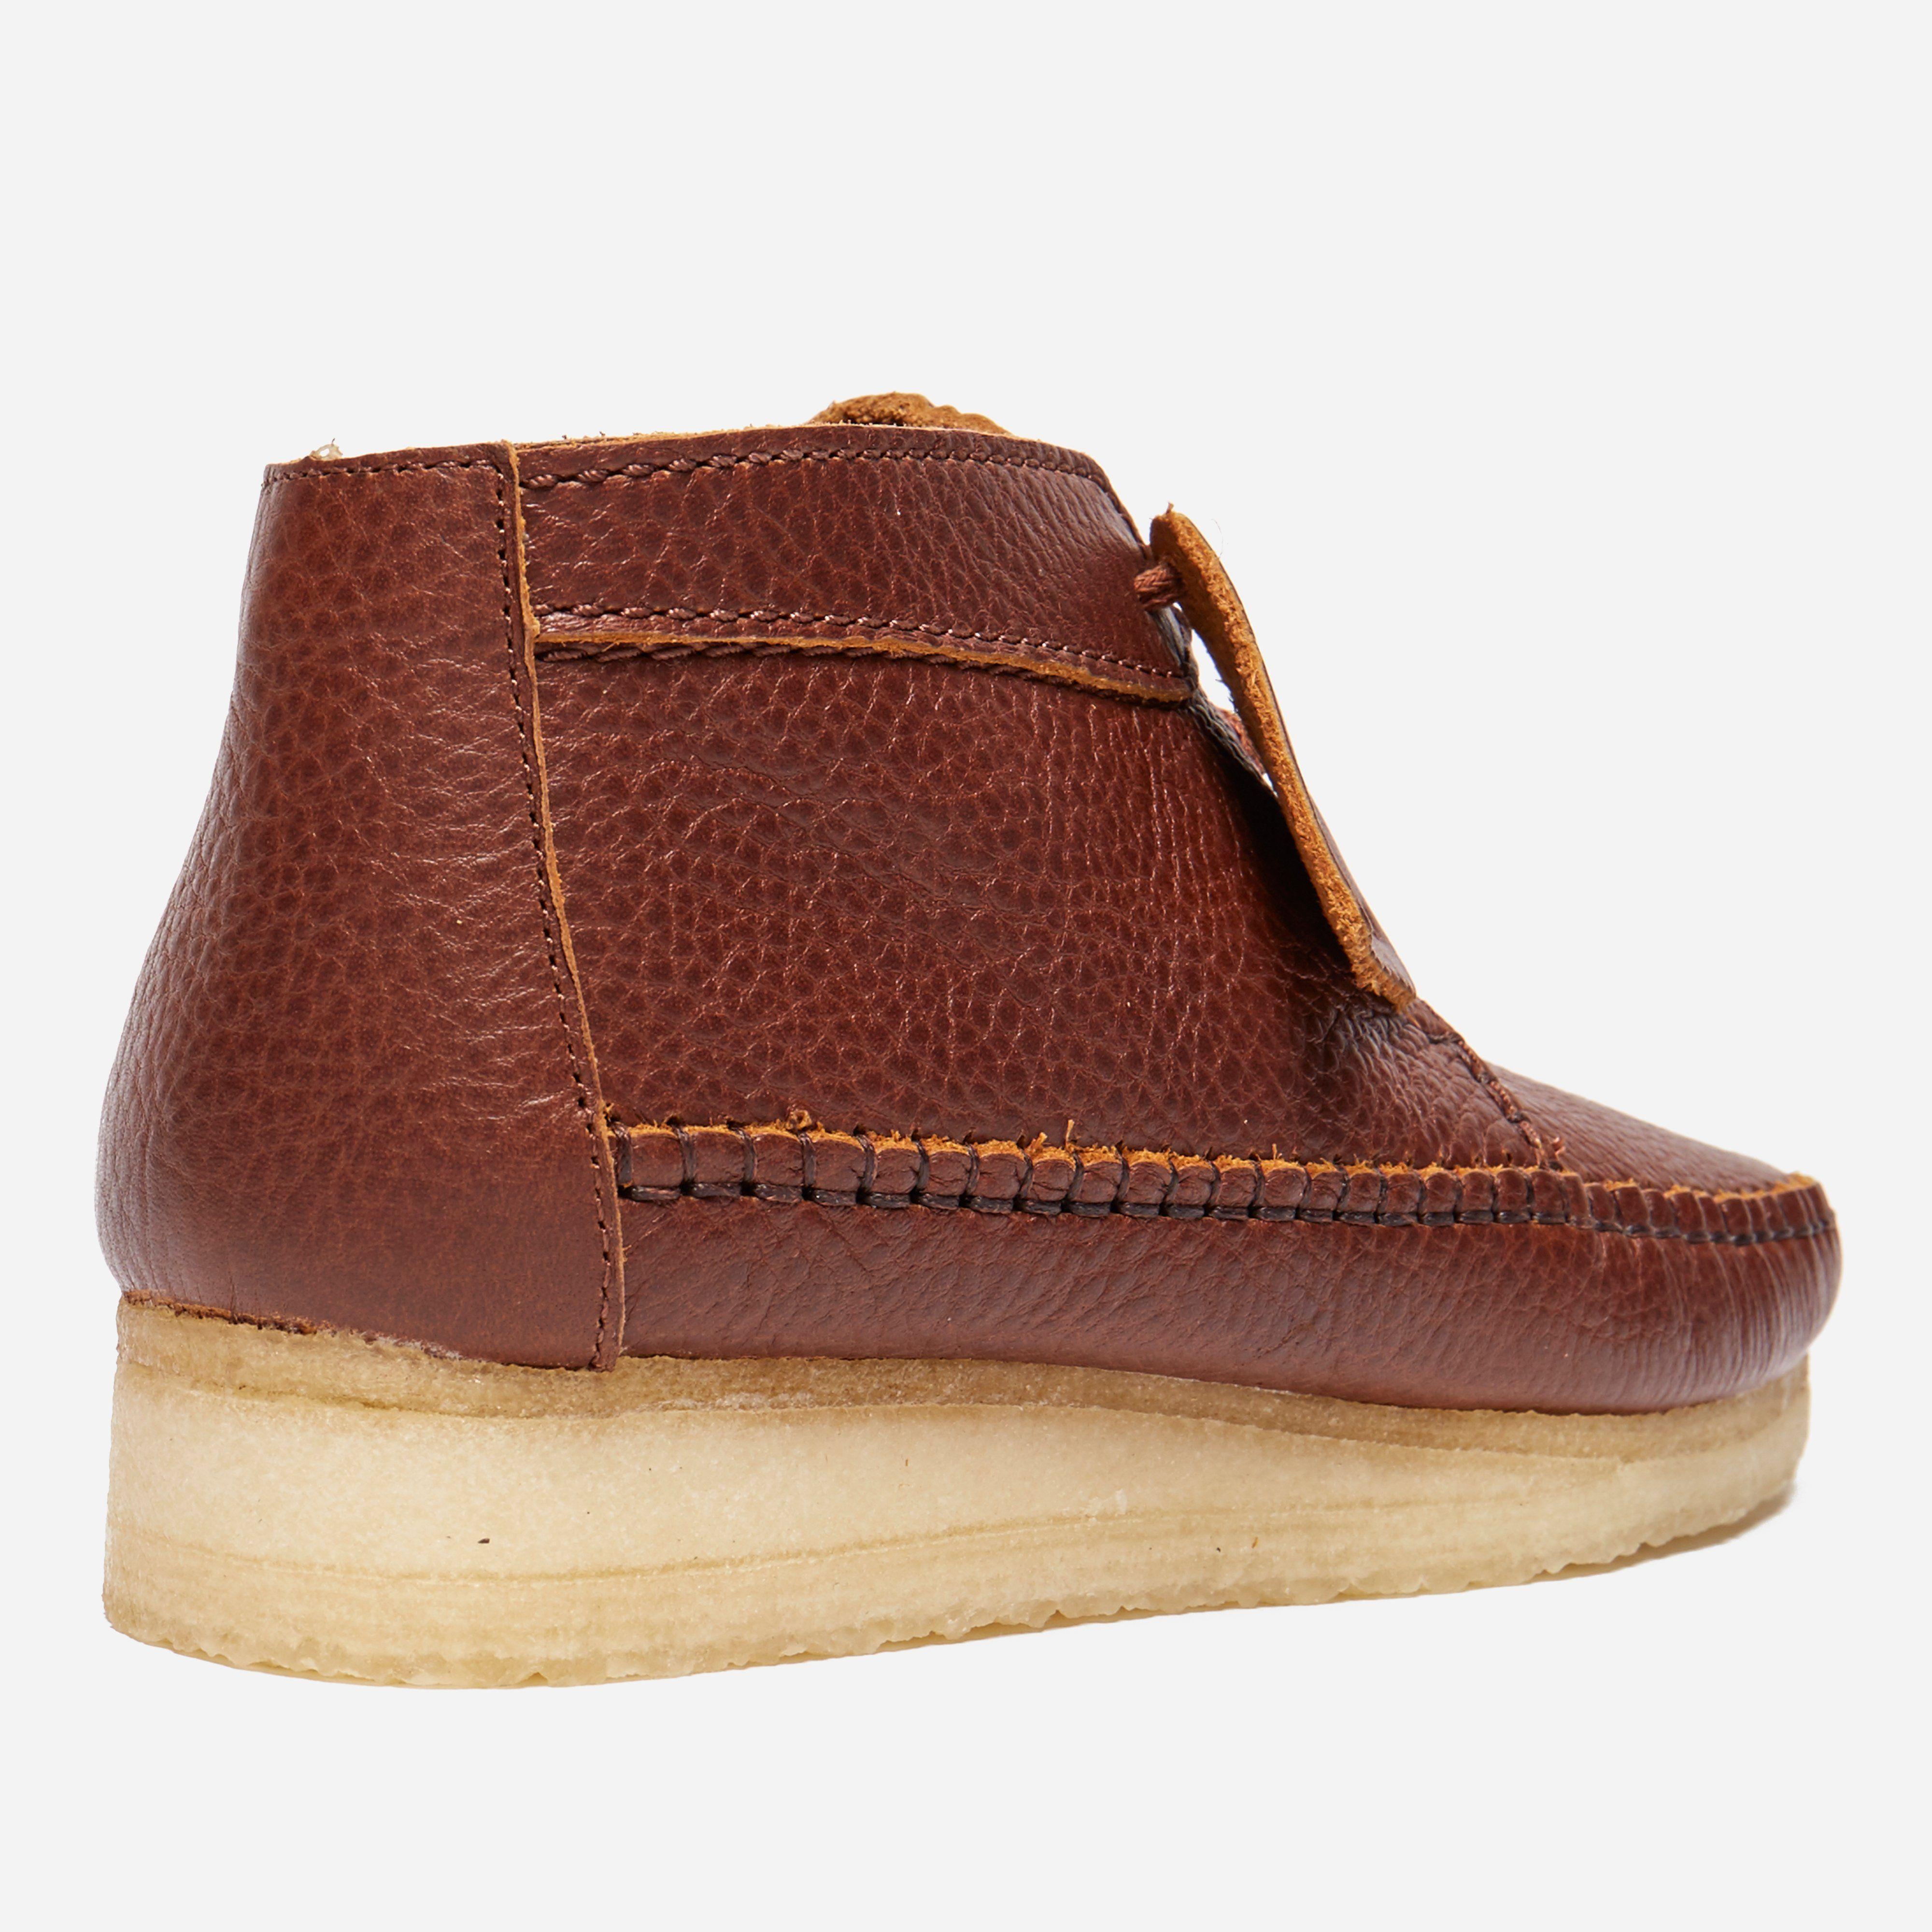 Clarks Originals Weaver Boot Leather